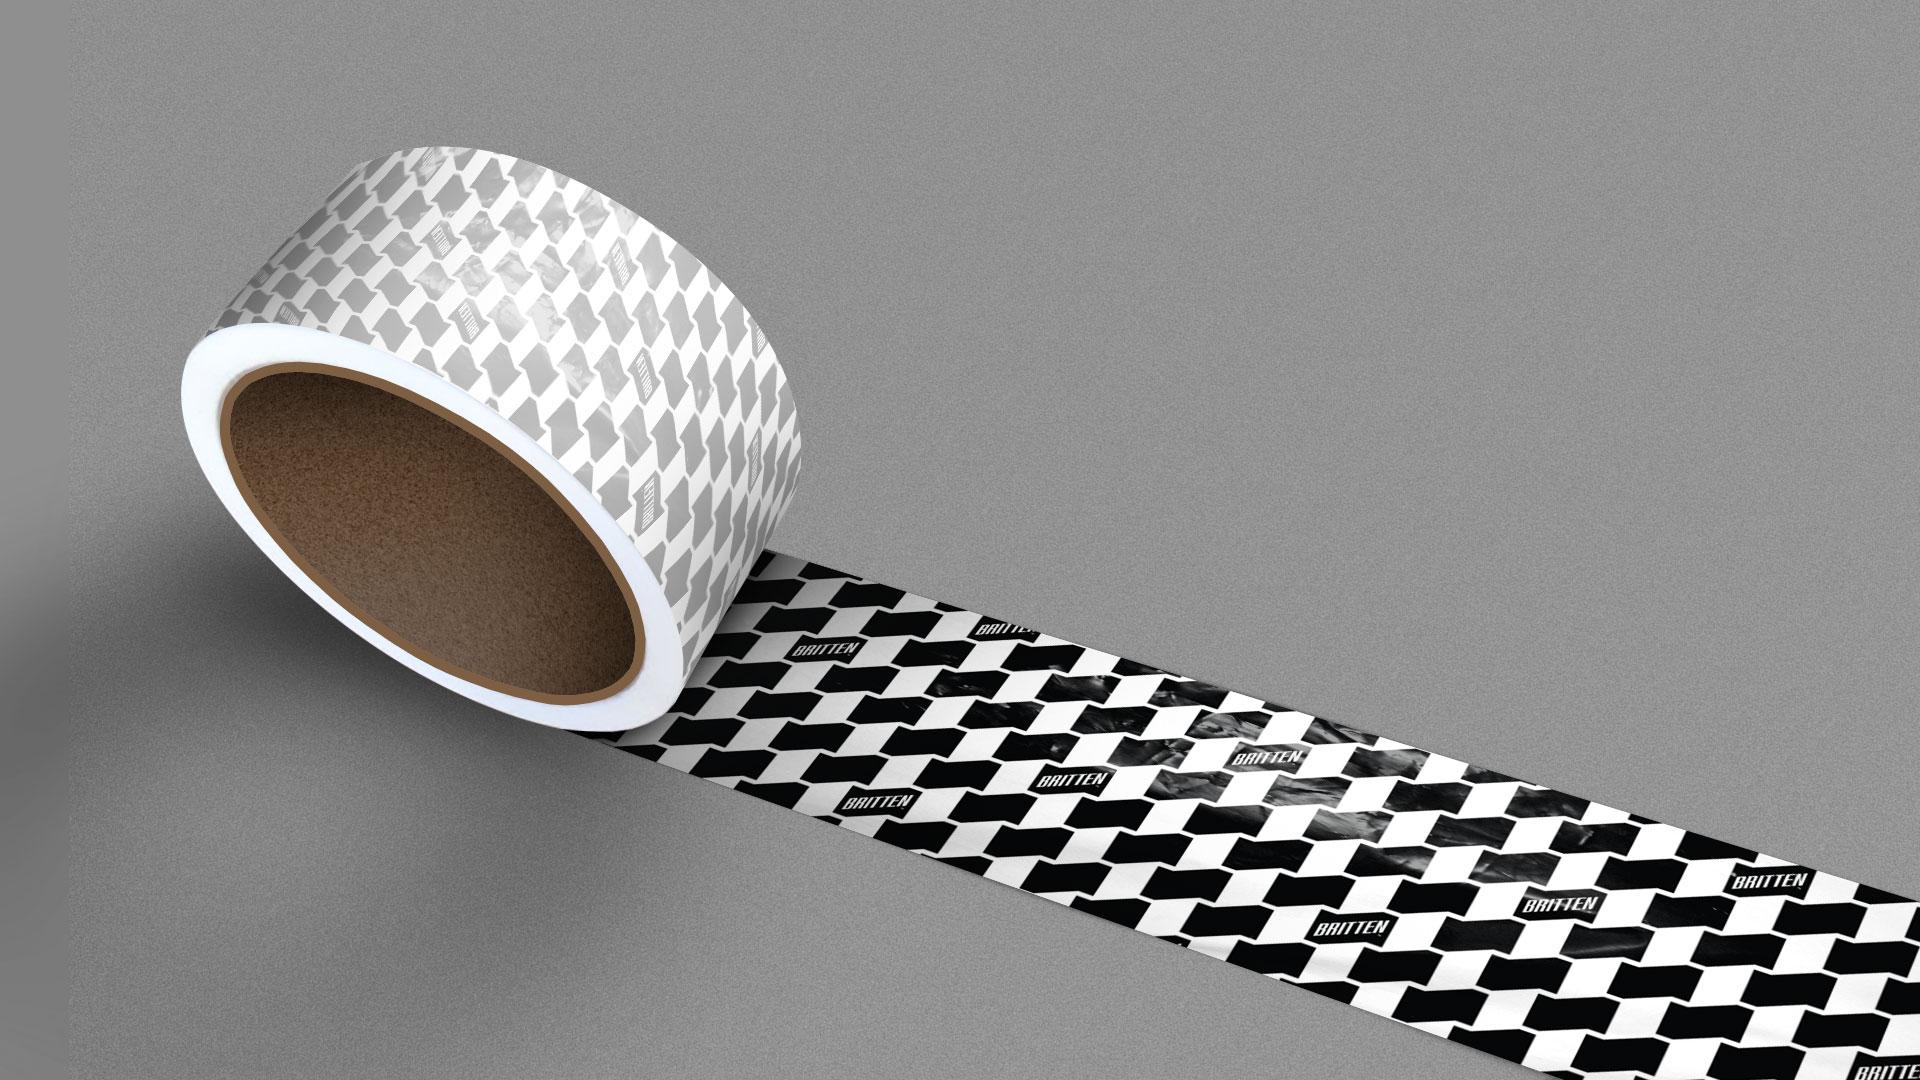 3D_britten_tape_1920w.jpg